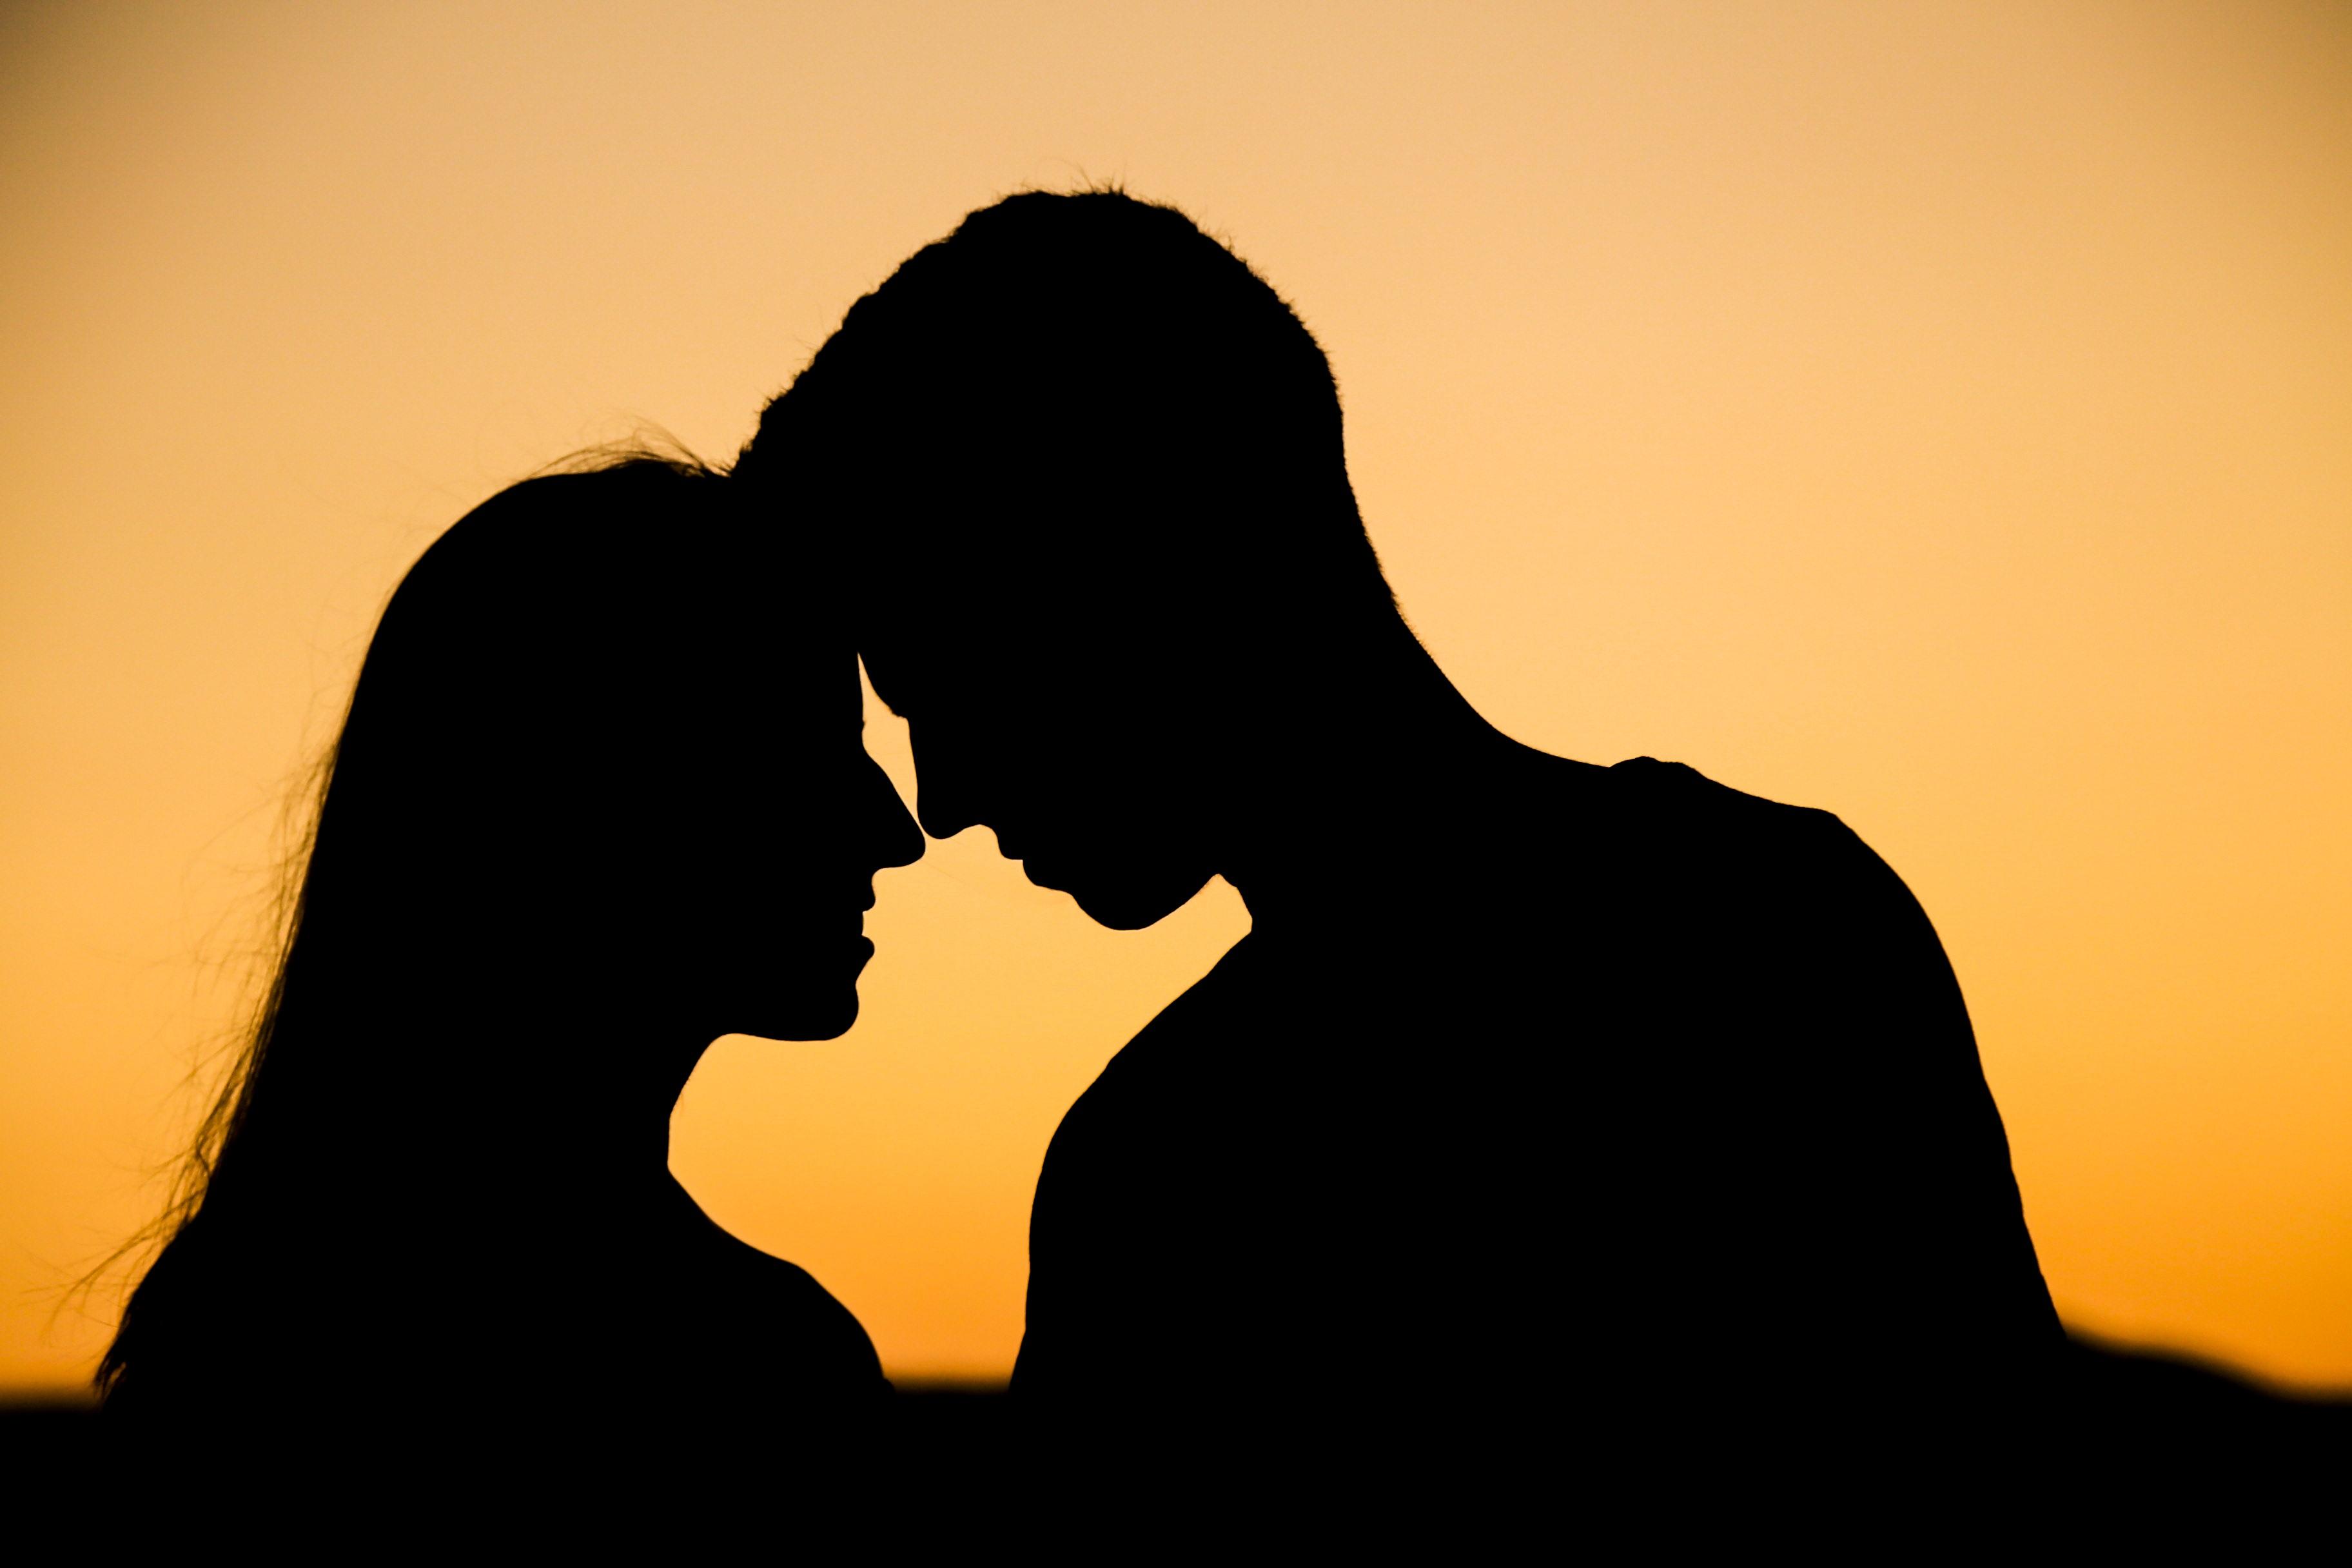 3648x2432 Free Stock Photo Of Devotion, Love, Silhouette